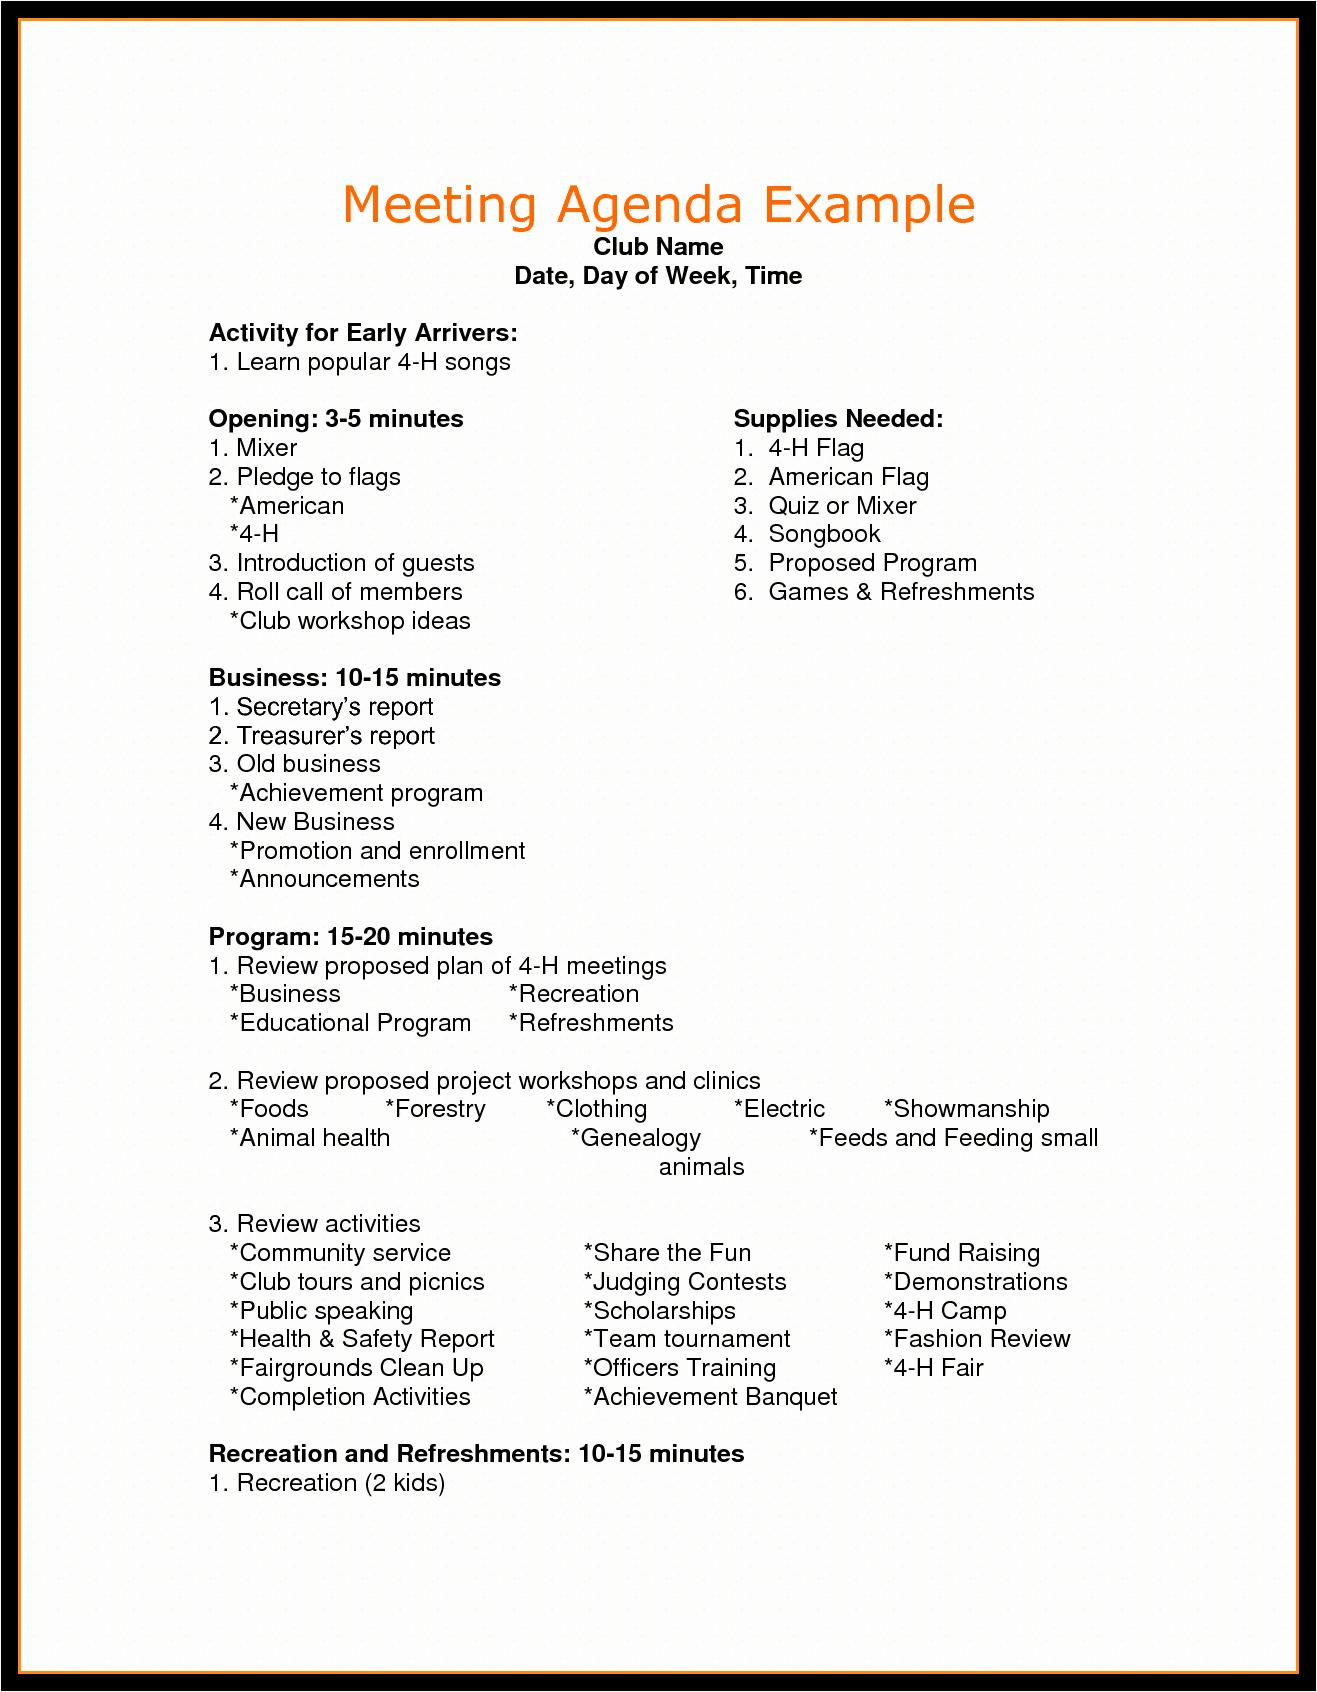 Example Of Meeting Agenda format Fresh Agenda for Meeting Example Mughals